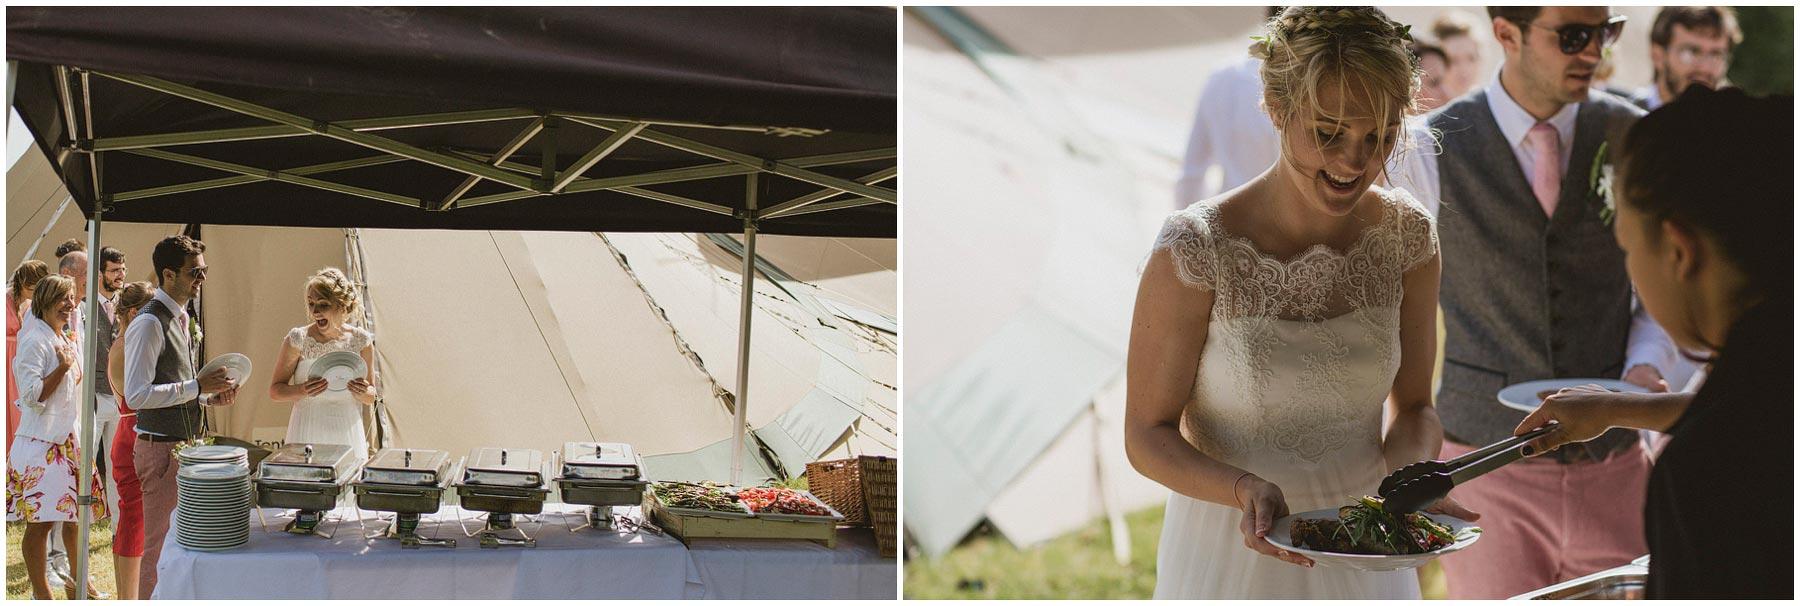 Kent-Festival-Tipi-wedding-photography_0110